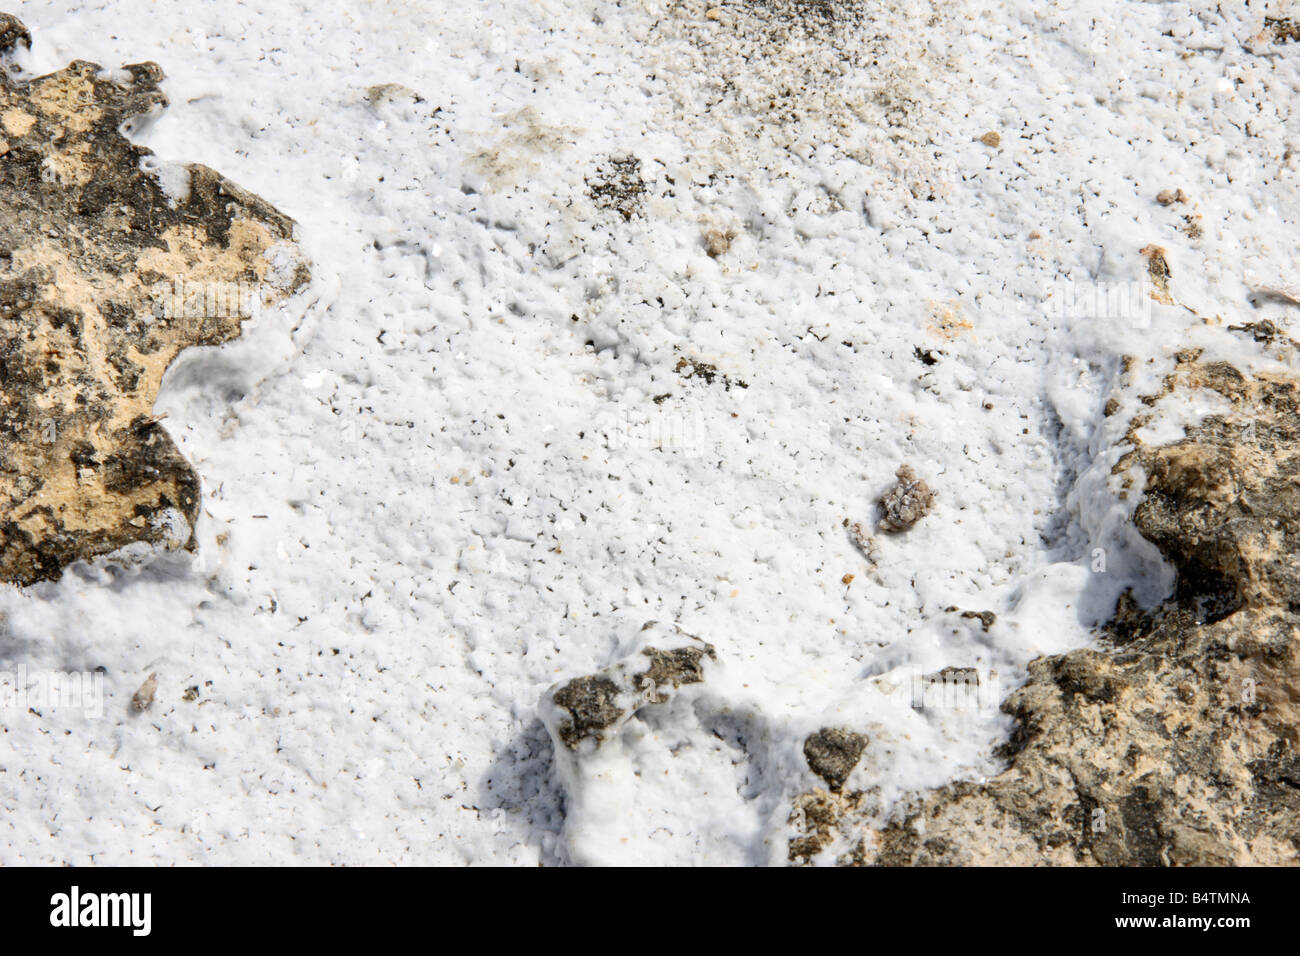 Natural sea salt, formed in the rocky crevice's of the seashore at Marsaskala in Malta. - Stock Image